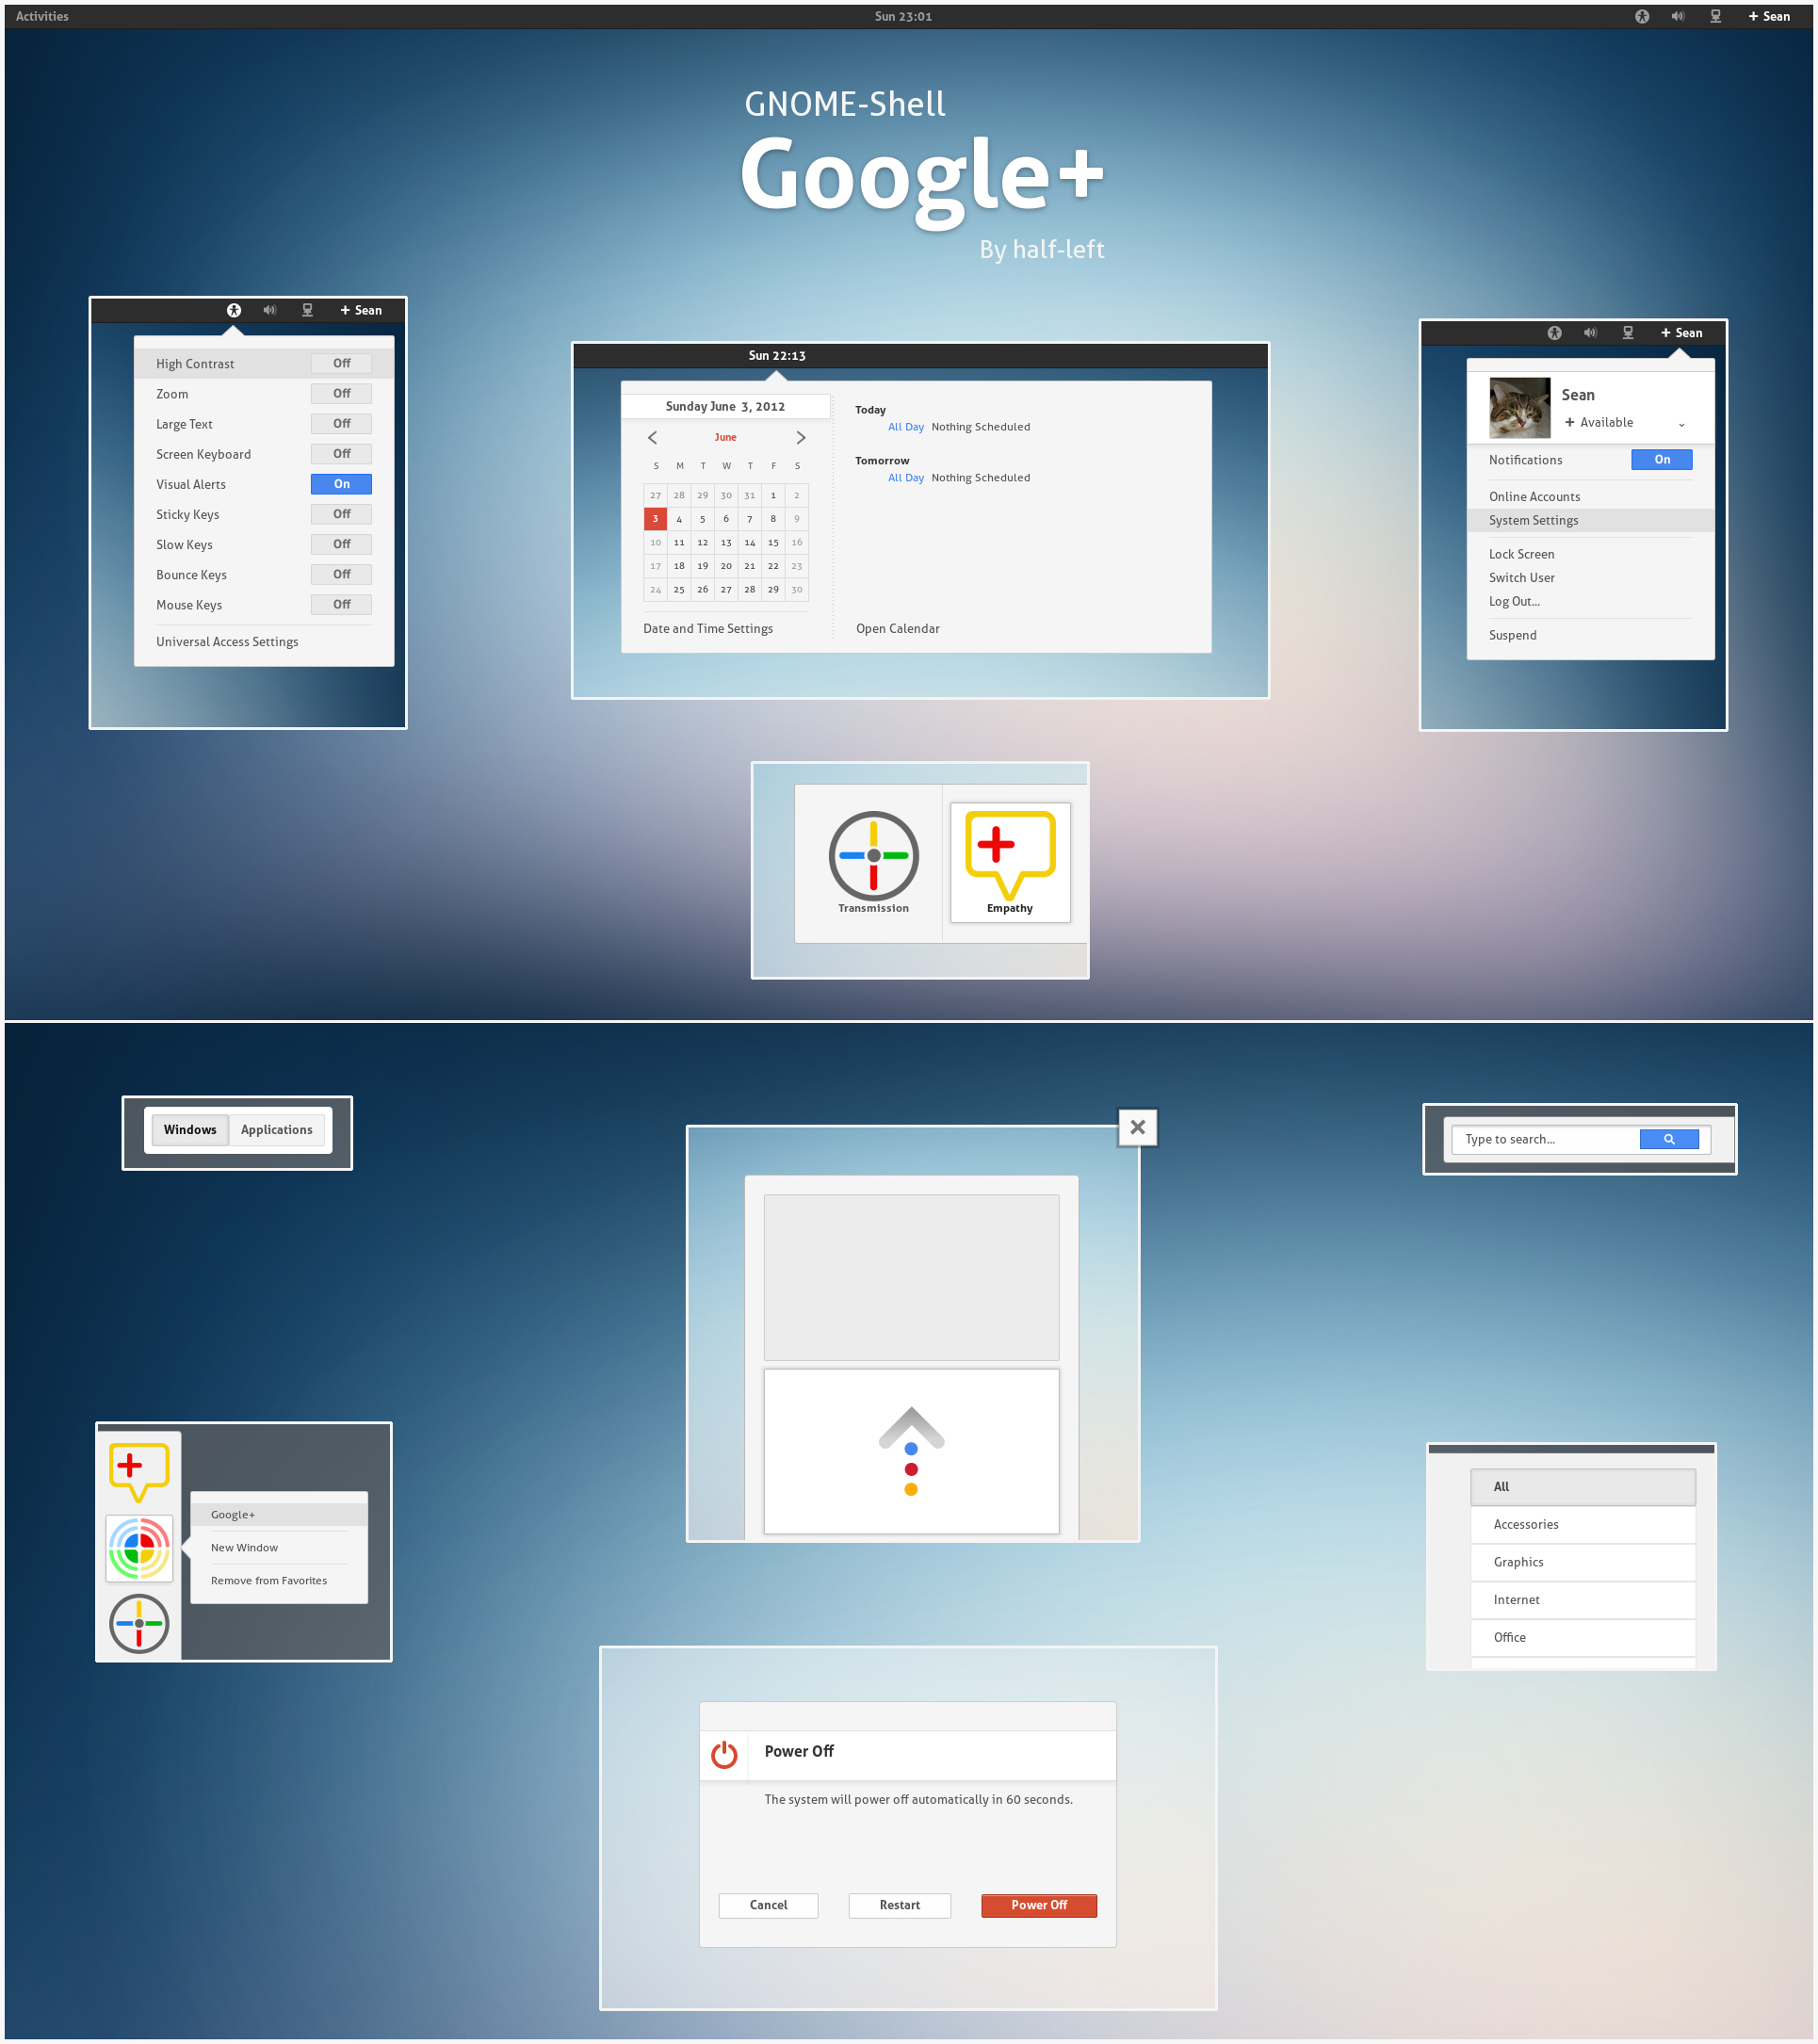 GNOME-Shell - Google+